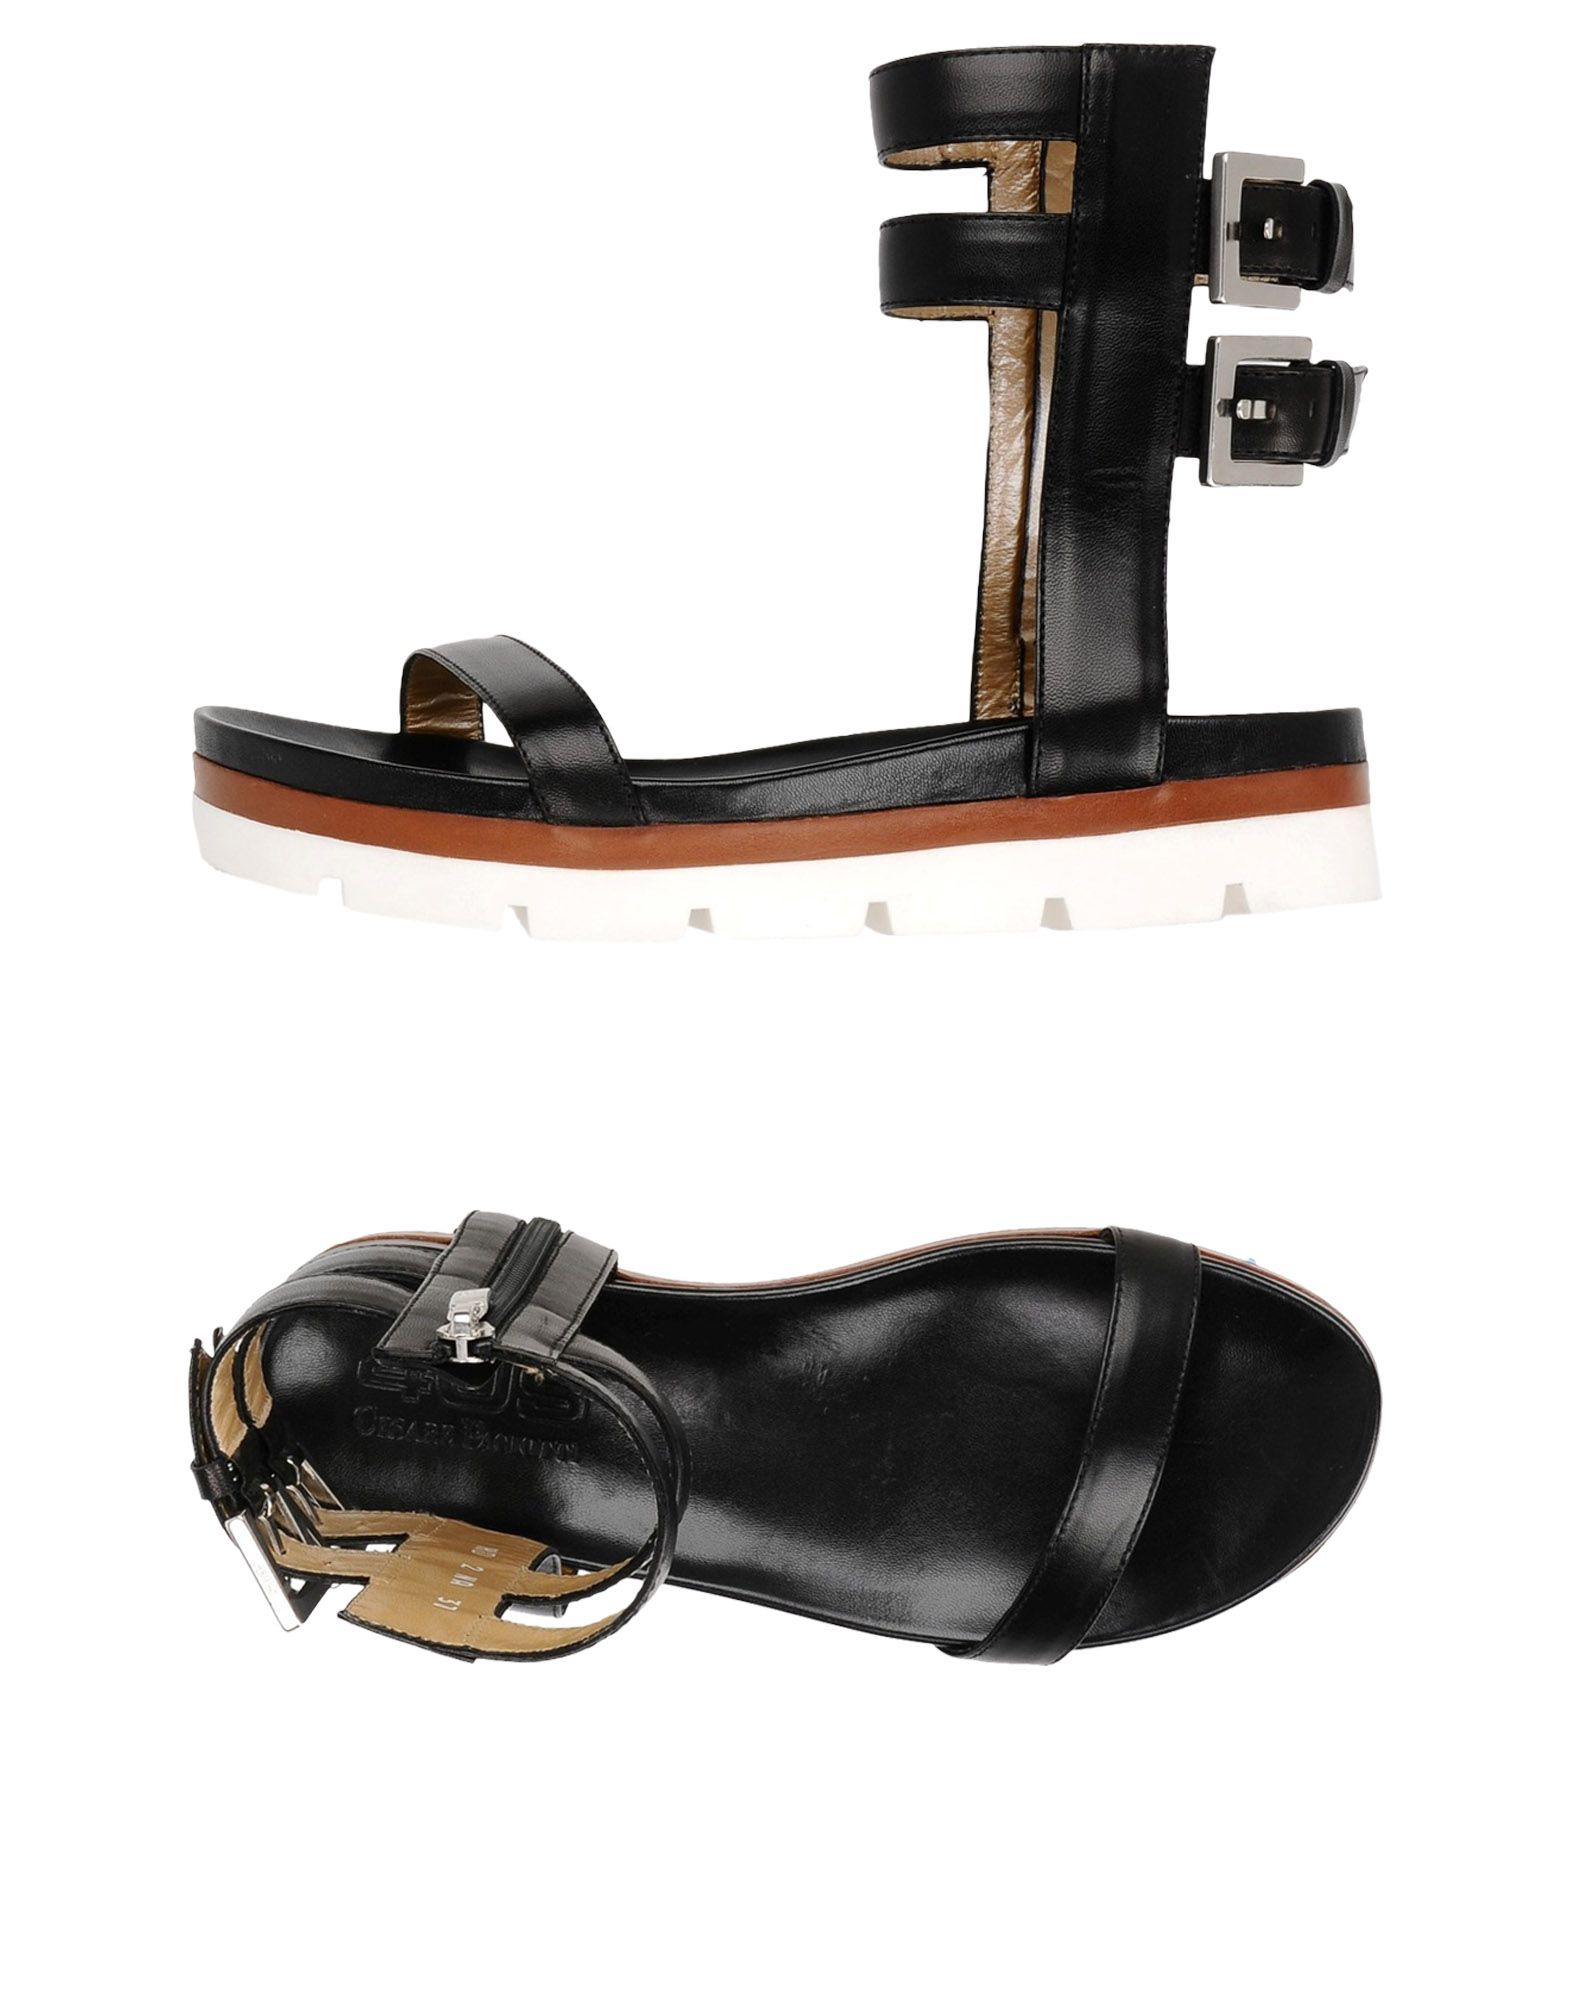 Gut um Paciotti billige Schuhe zu tragenCesare Paciotti um 4Us Sandalen Damen  11388650RM 455215